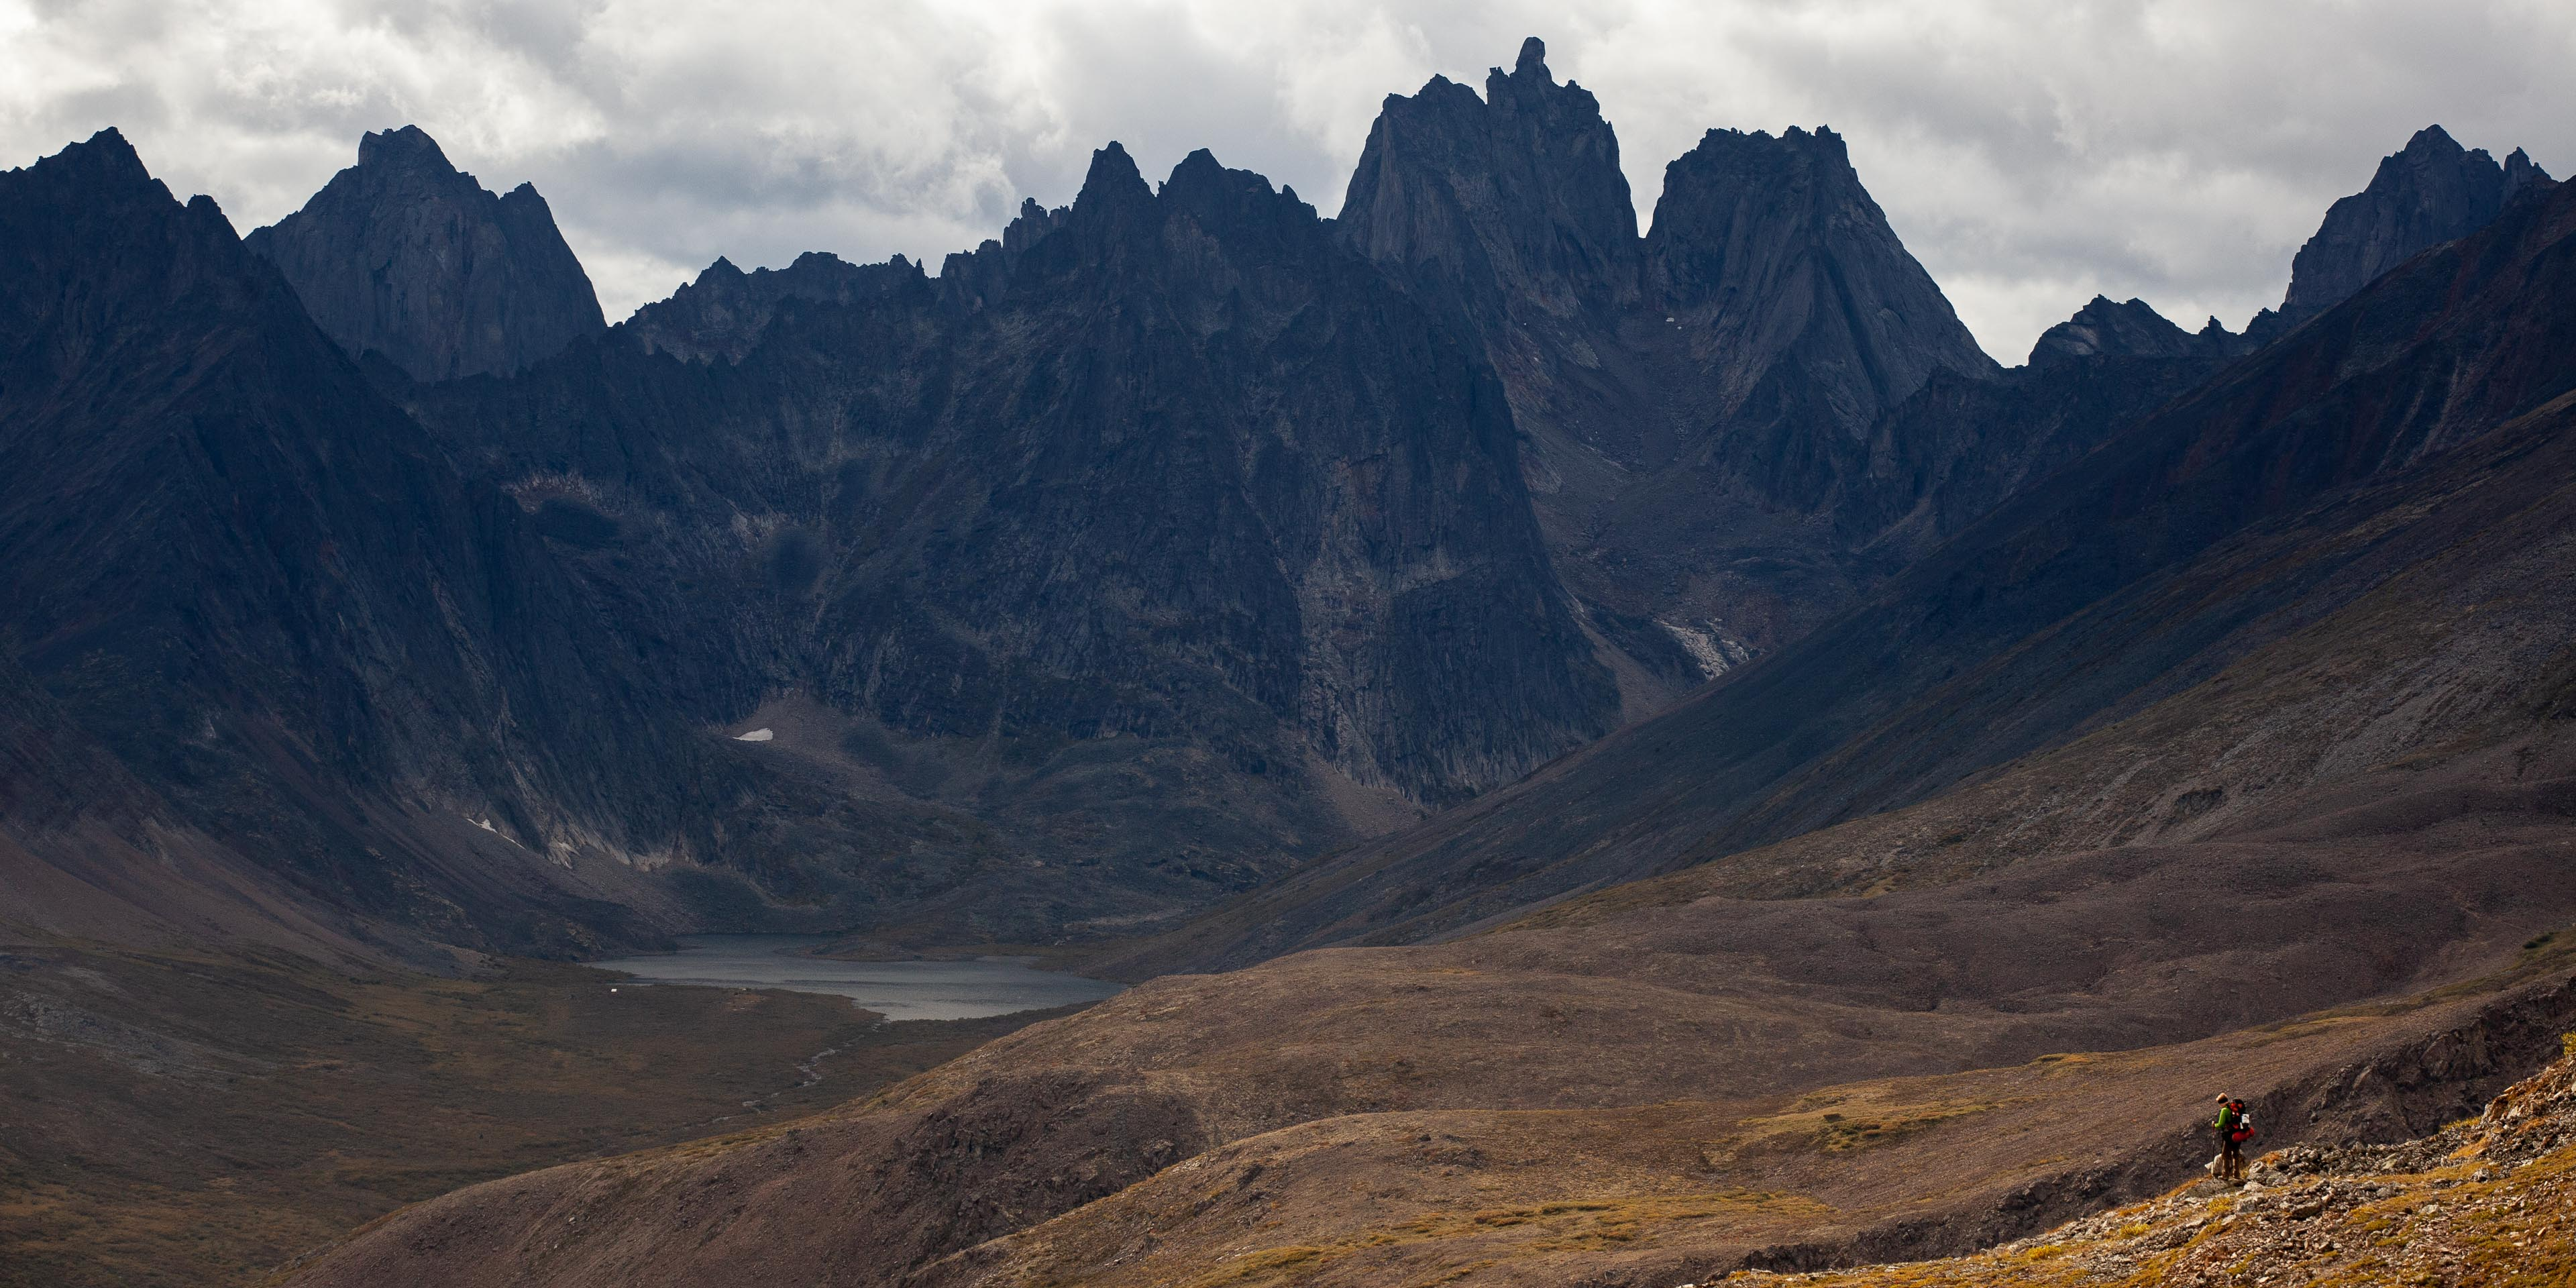 Tombstone mountains, Yukon Territory